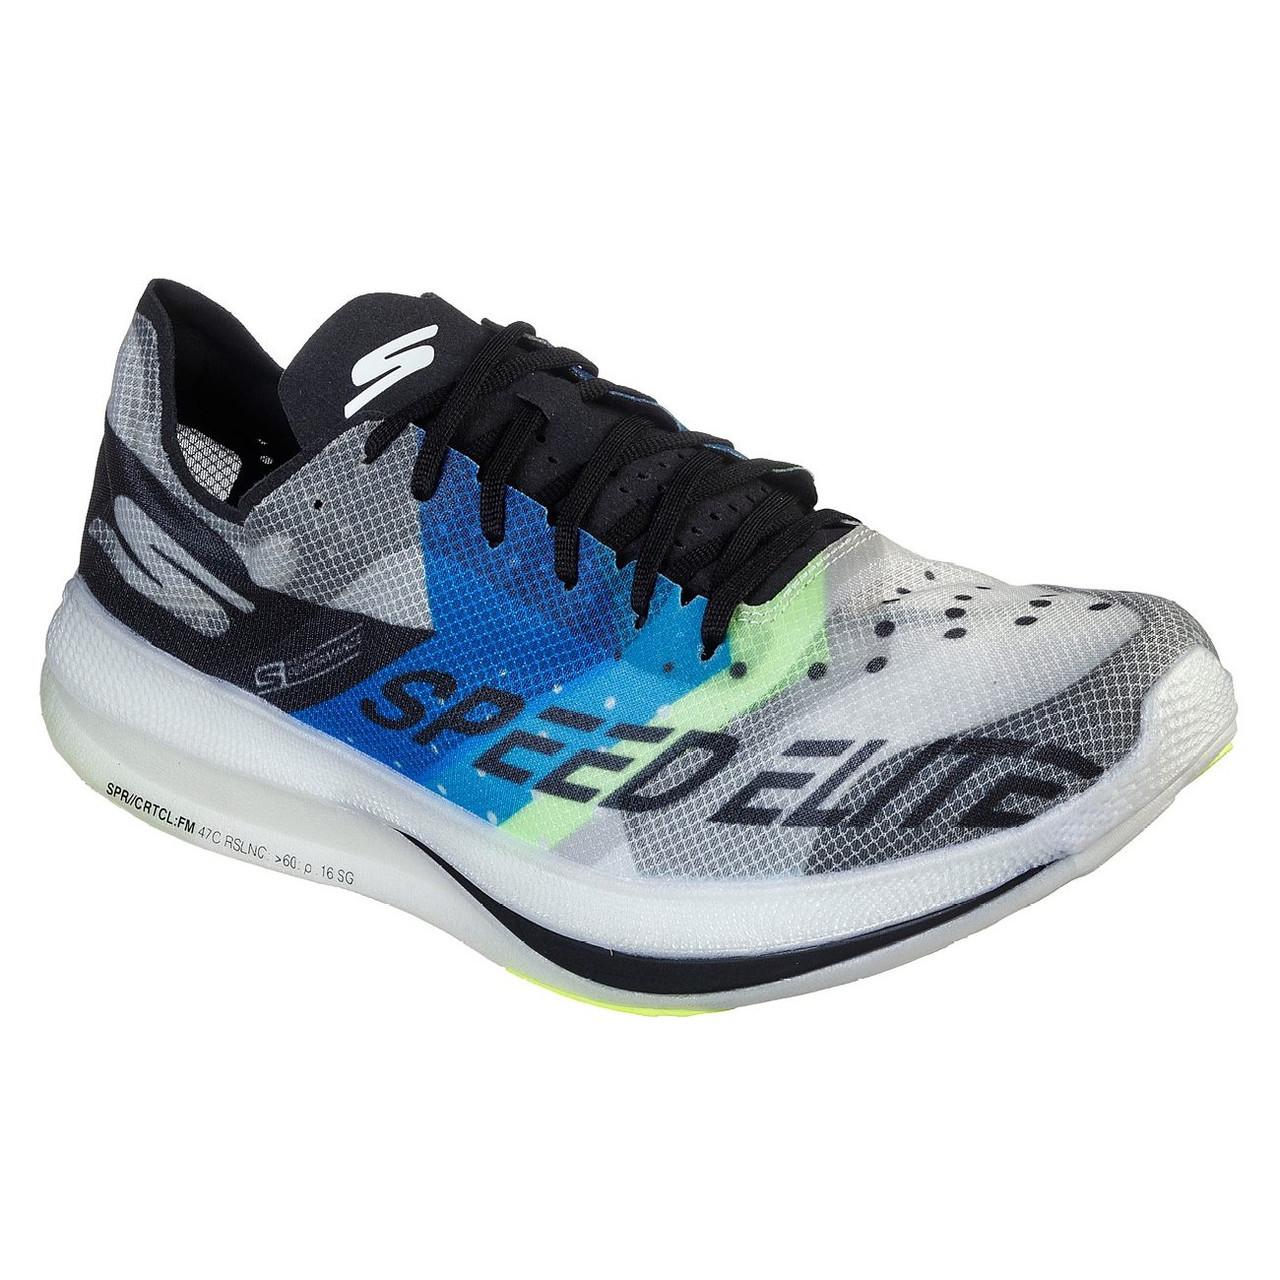 Skechers Men's GOrun Speed Elite Hyper Shoe